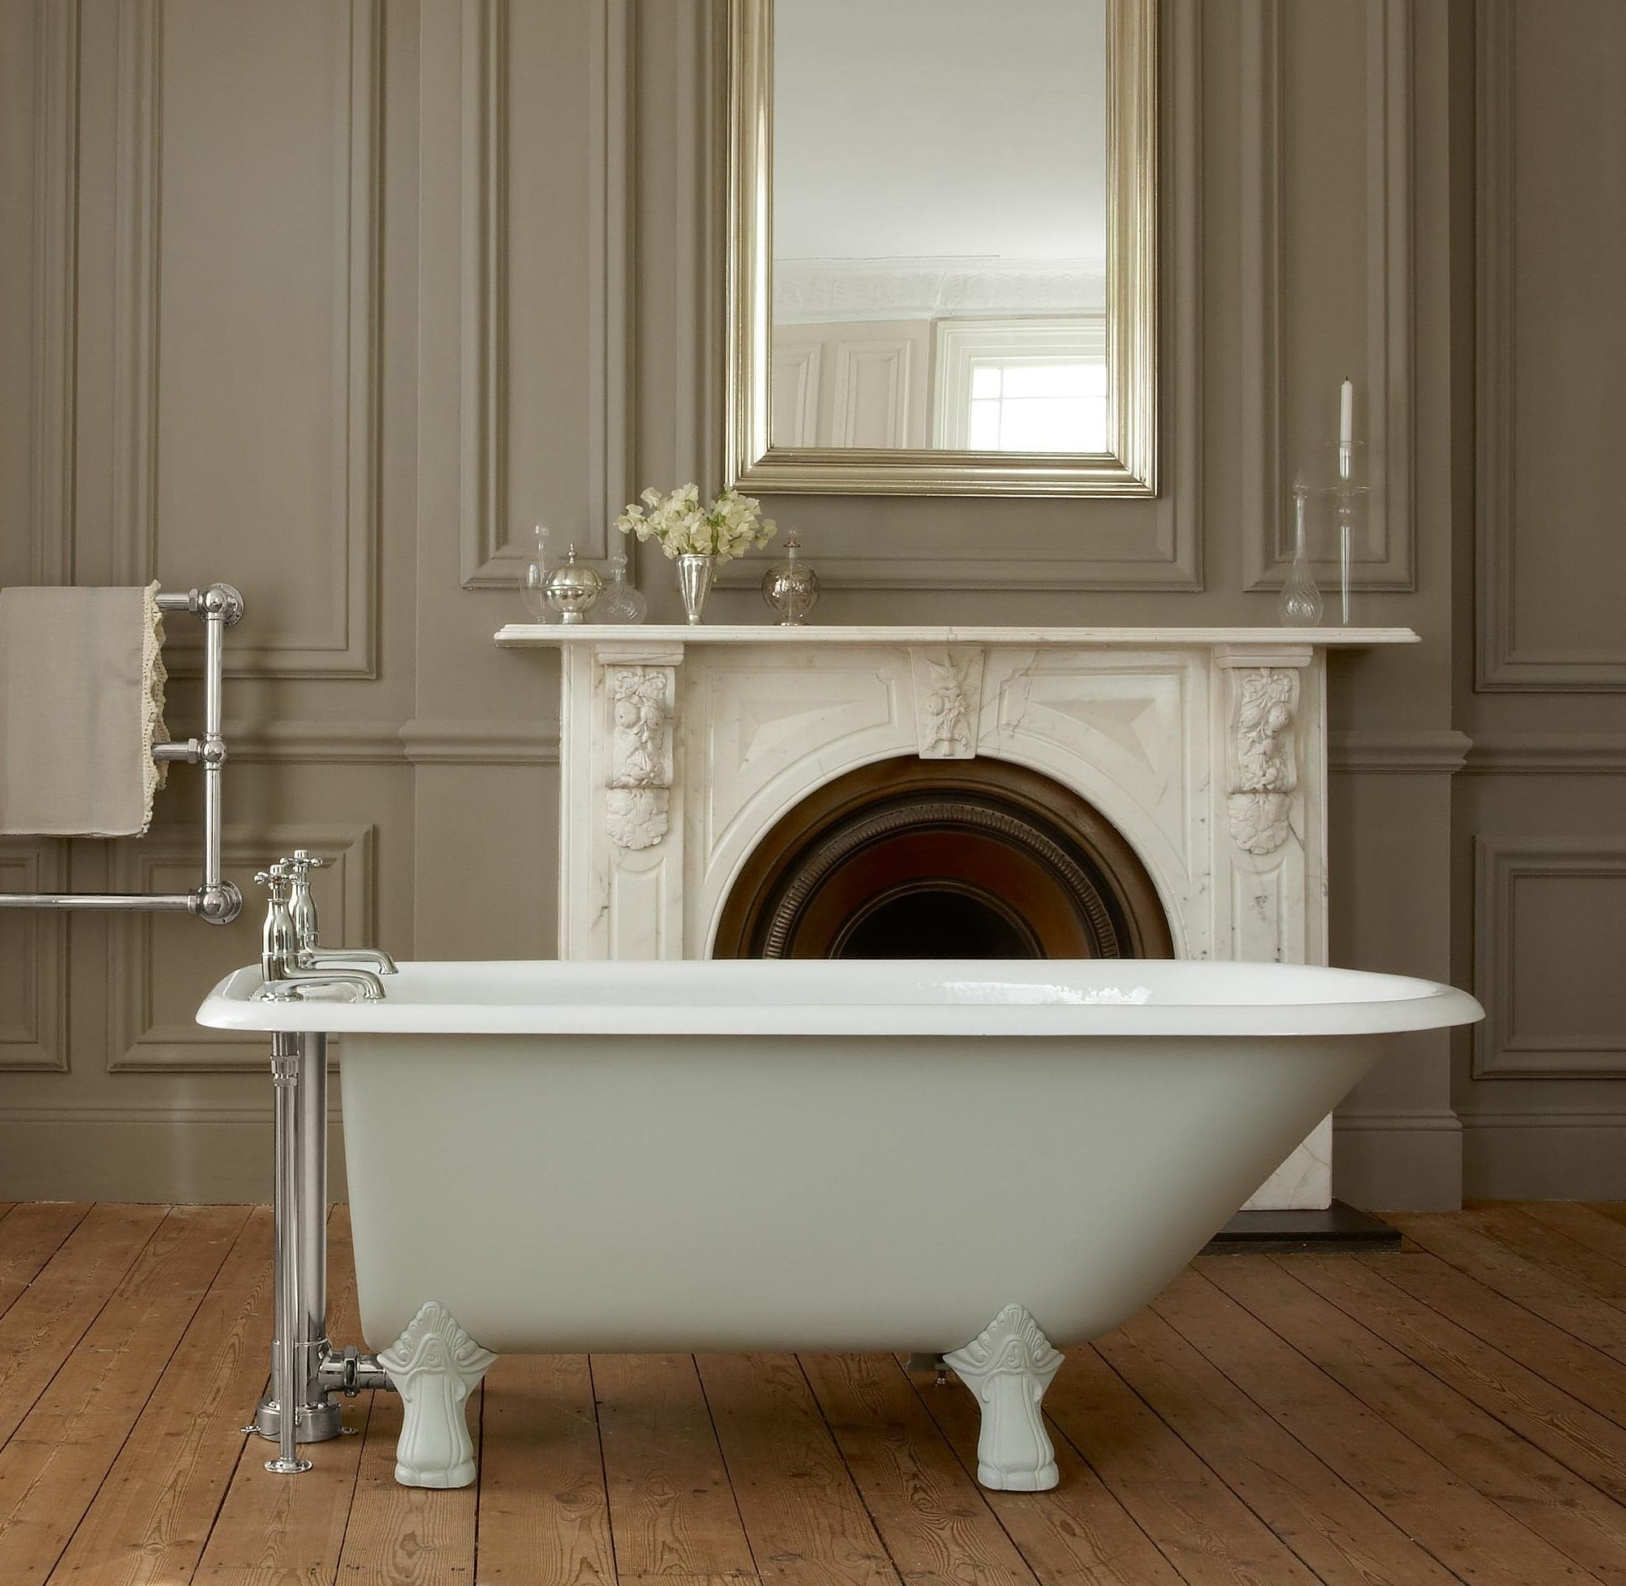 The Clyde cast iron single ended bath tub